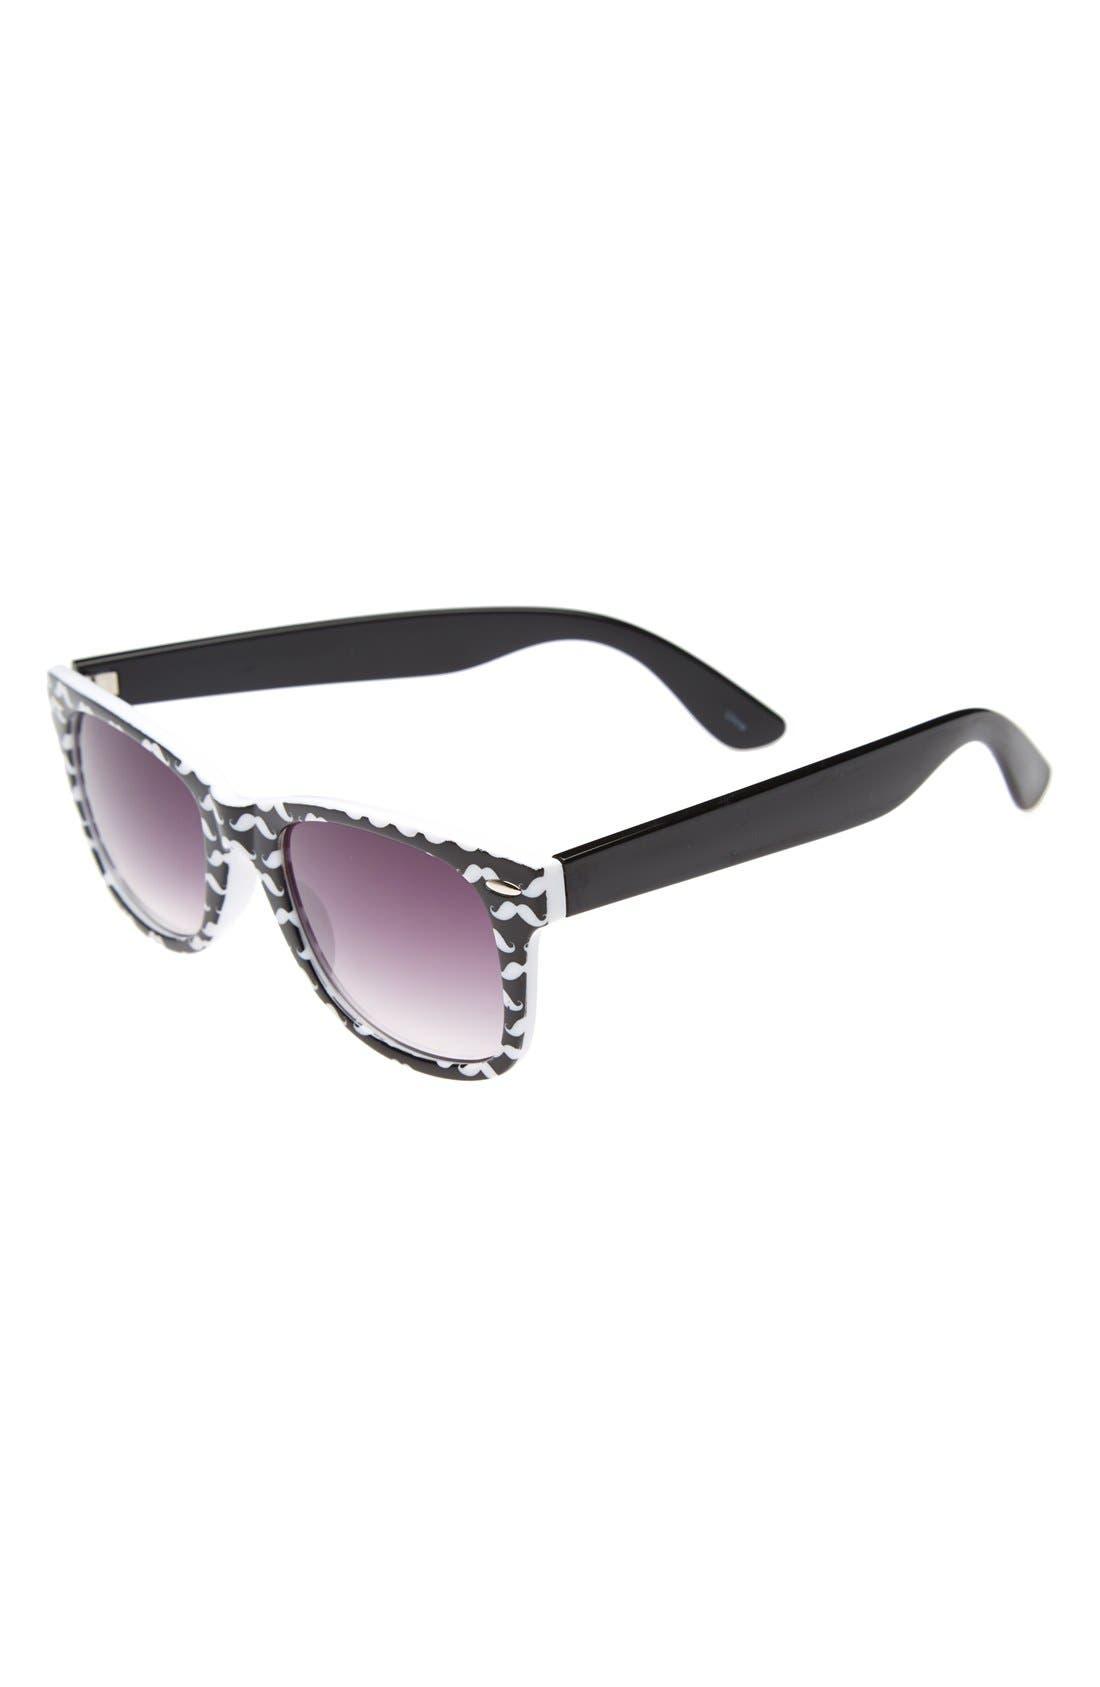 Main Image - Icon Eyewear 50mm Retro Sunglasses (Girls)